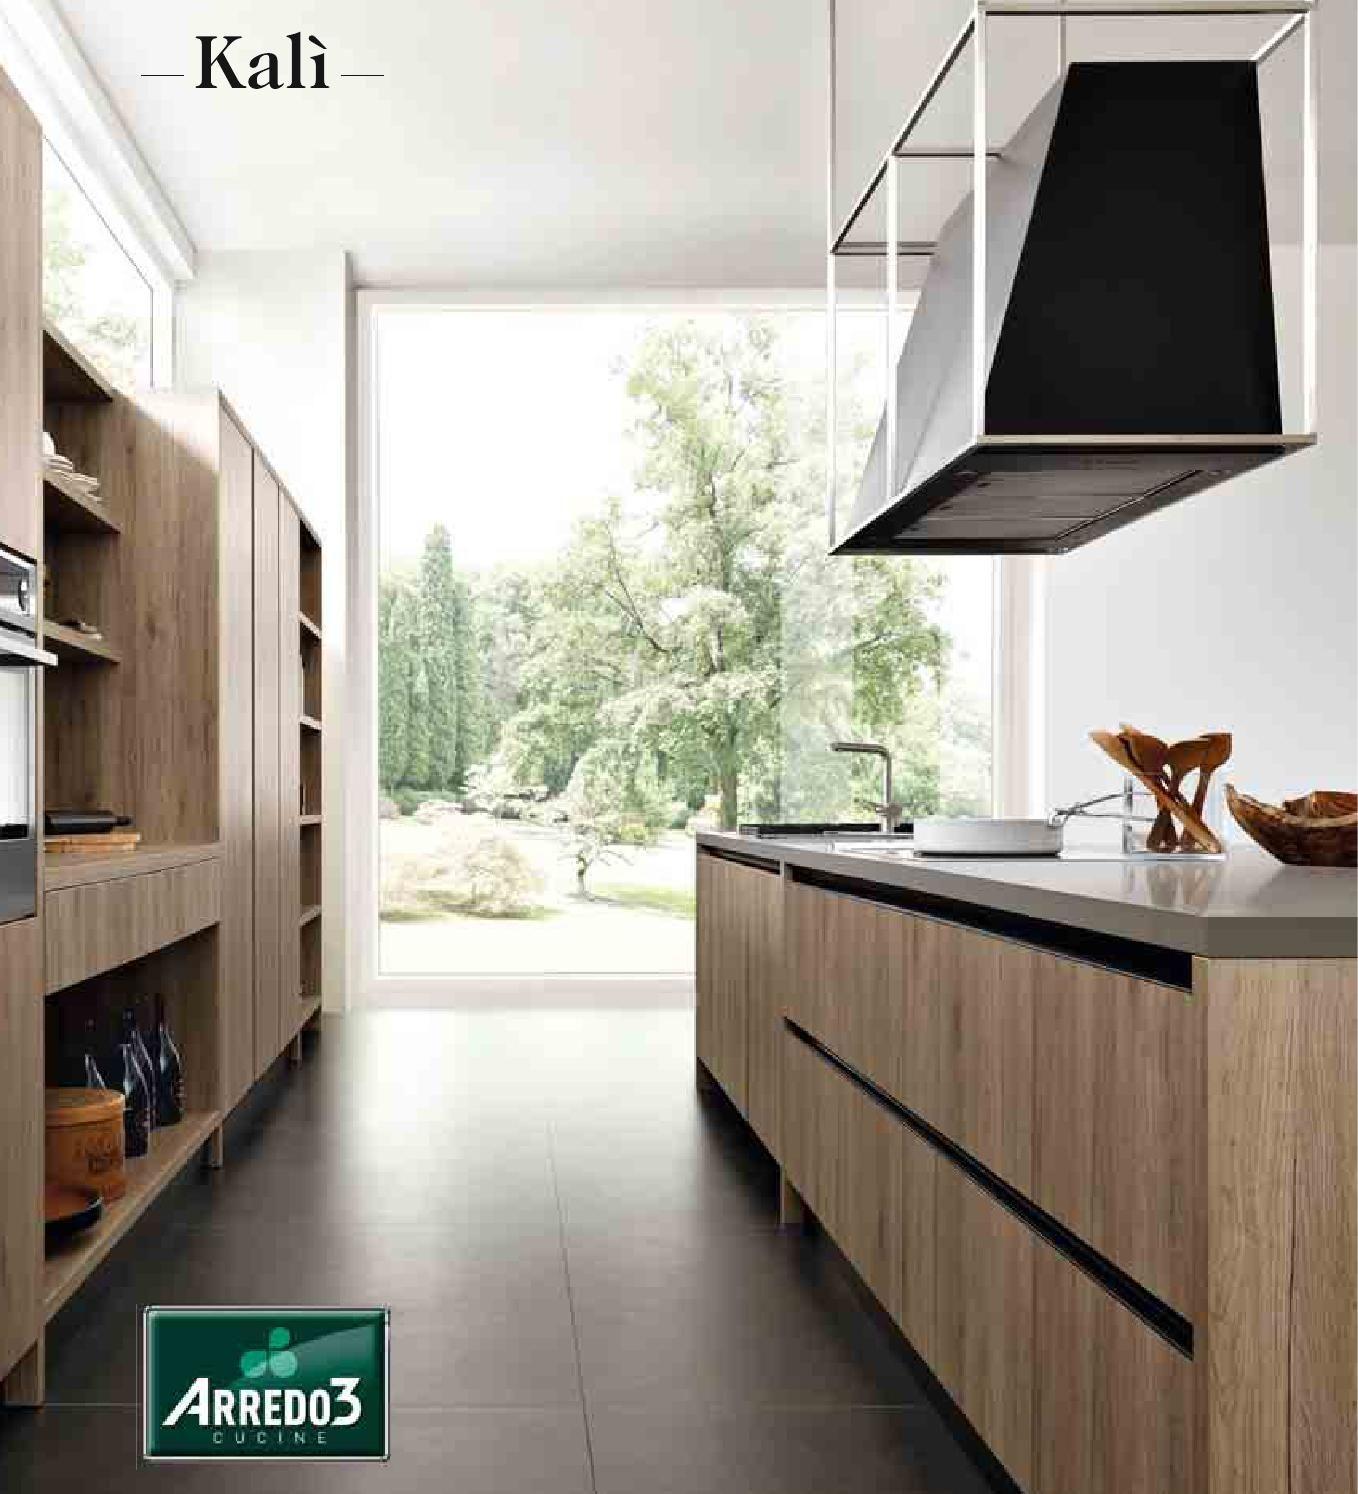 Arredo3 Kali By Petco Ae Kitchen Furniture Pinterest Deco